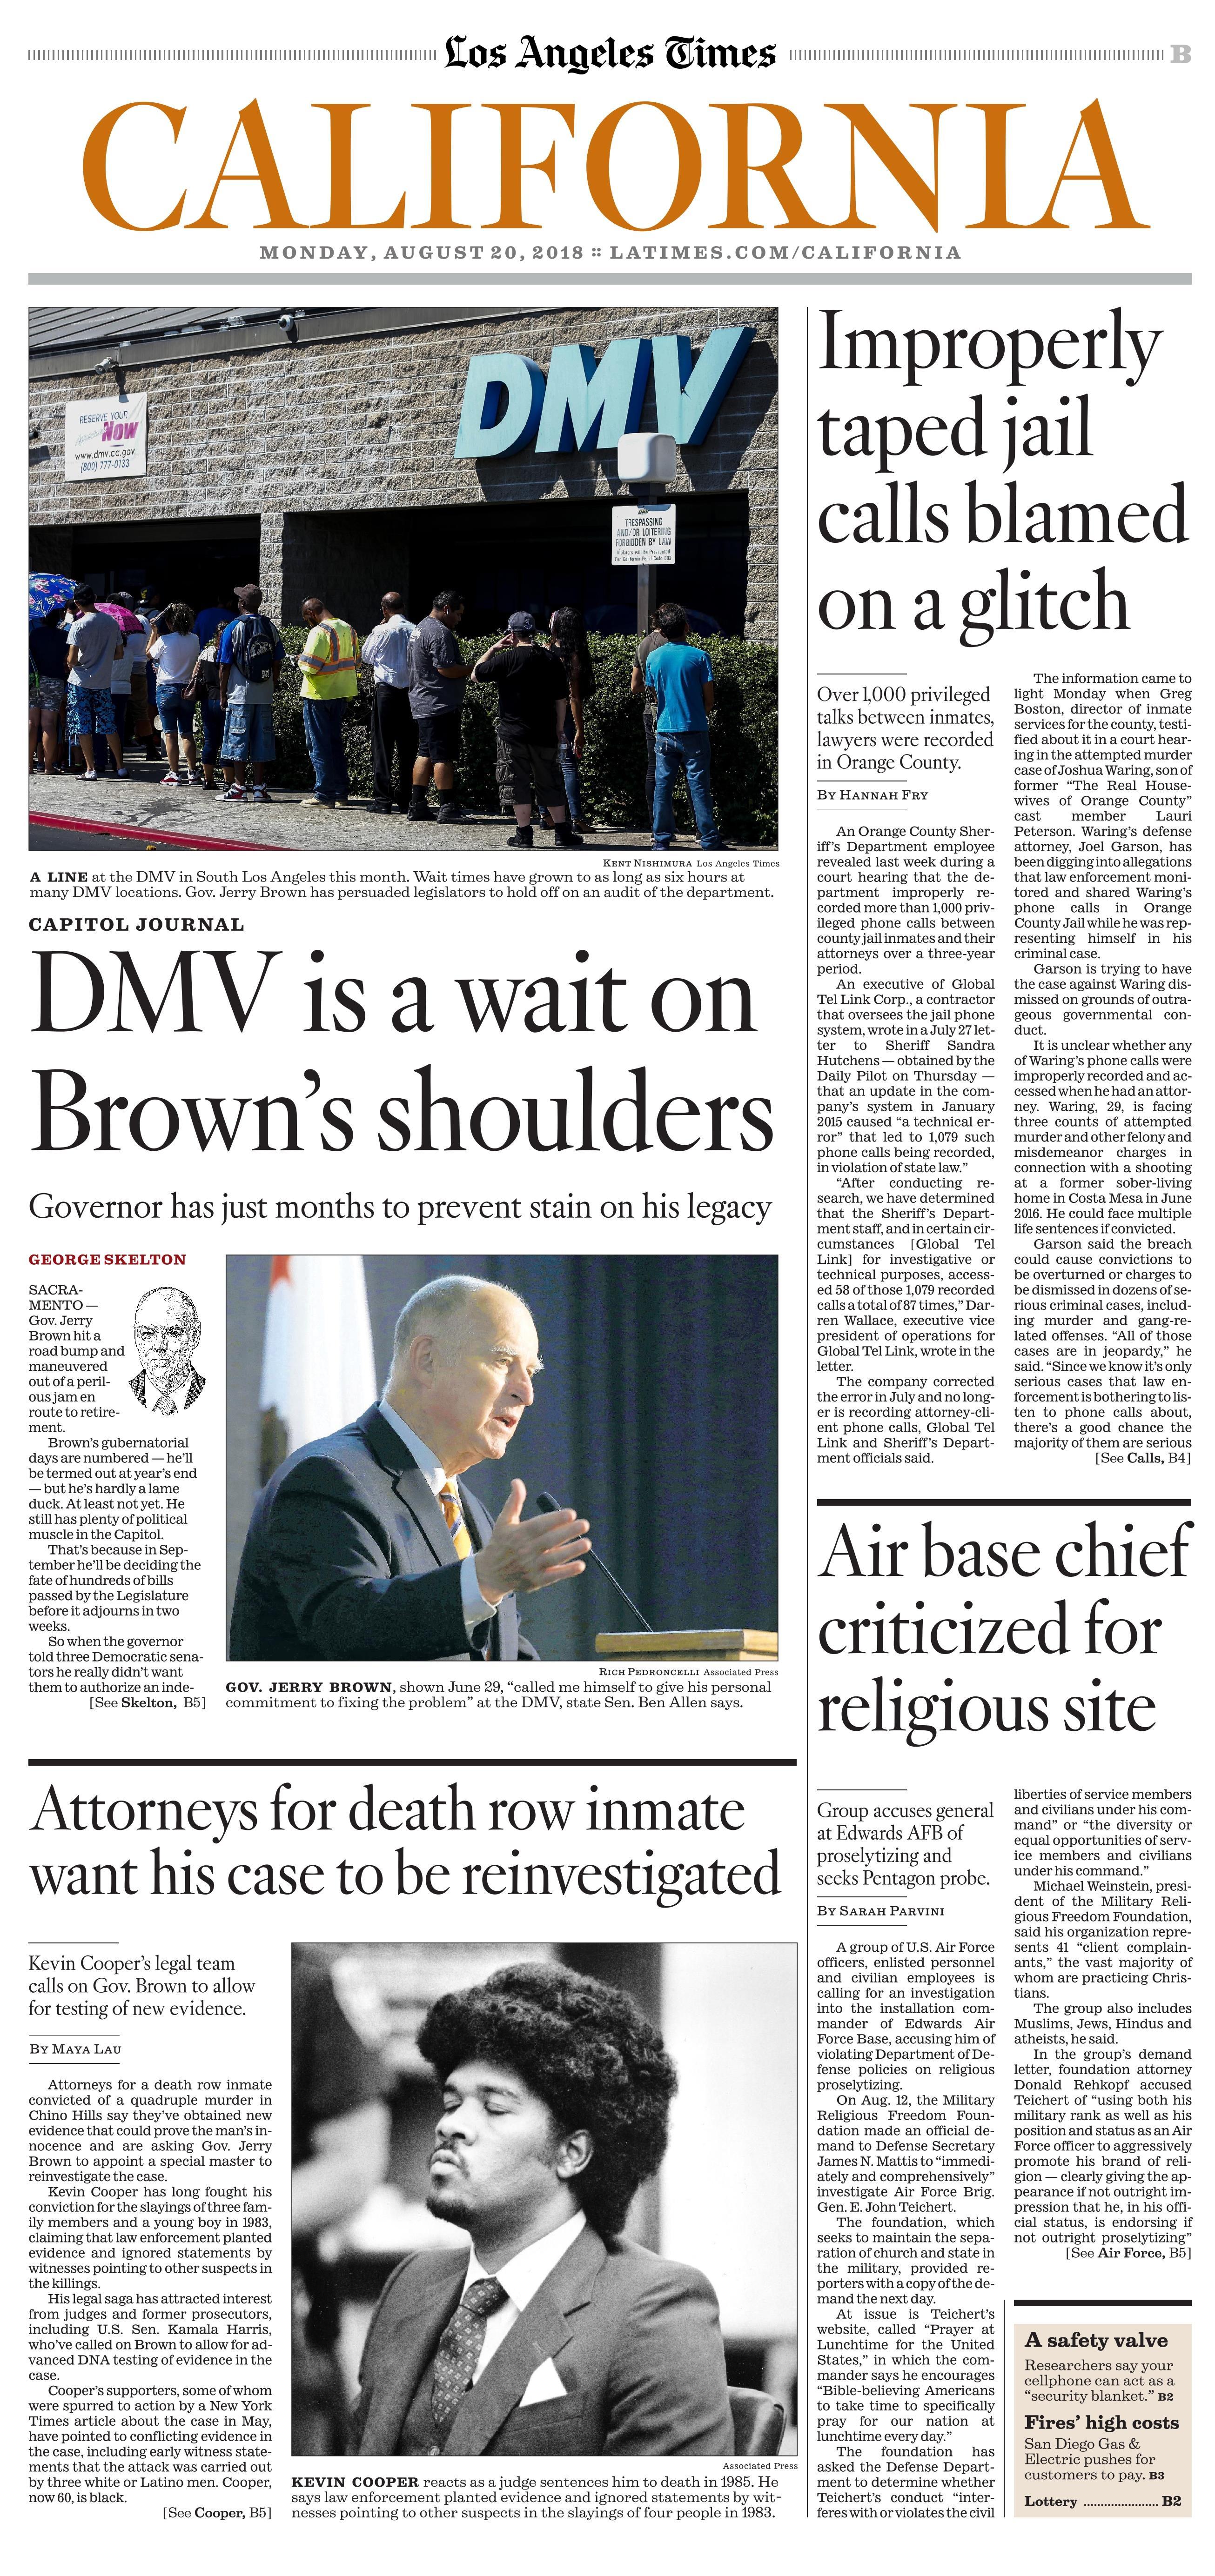 Los Angeles Times Uhrzeit